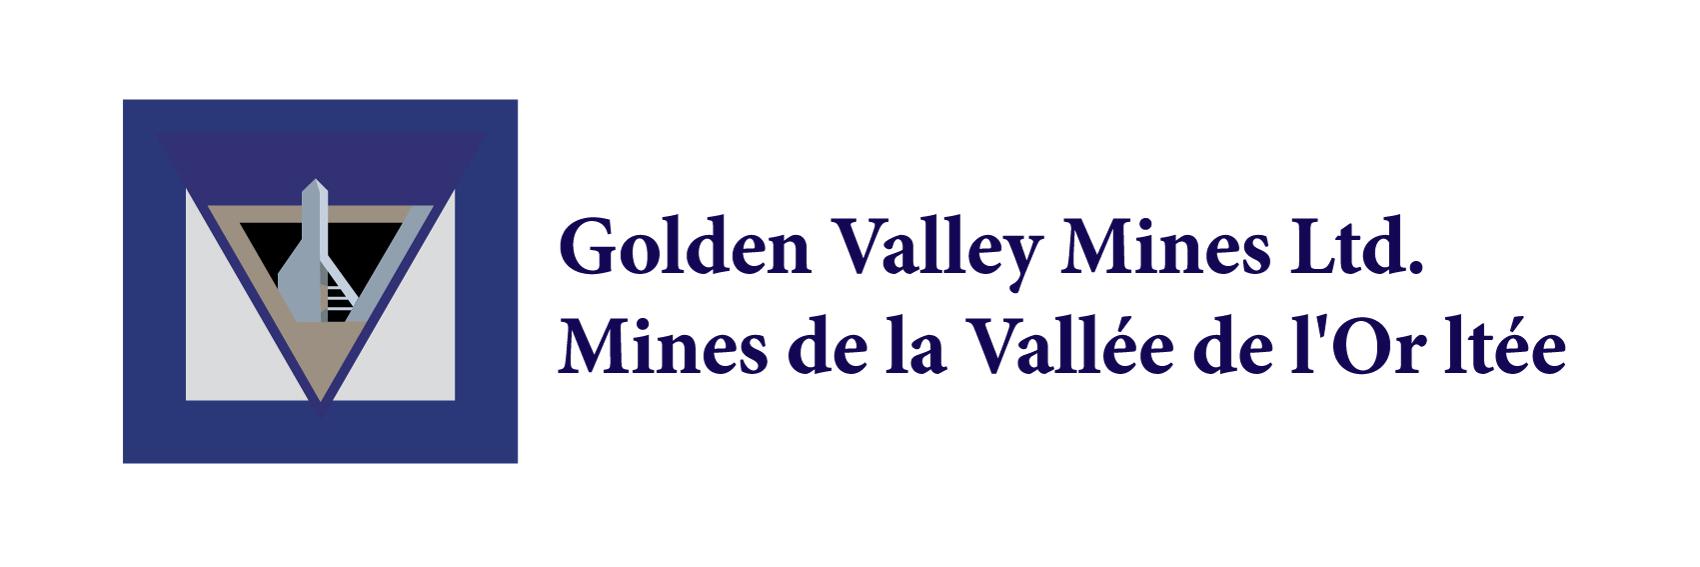 Golden Valley Mines Announces Option Grants